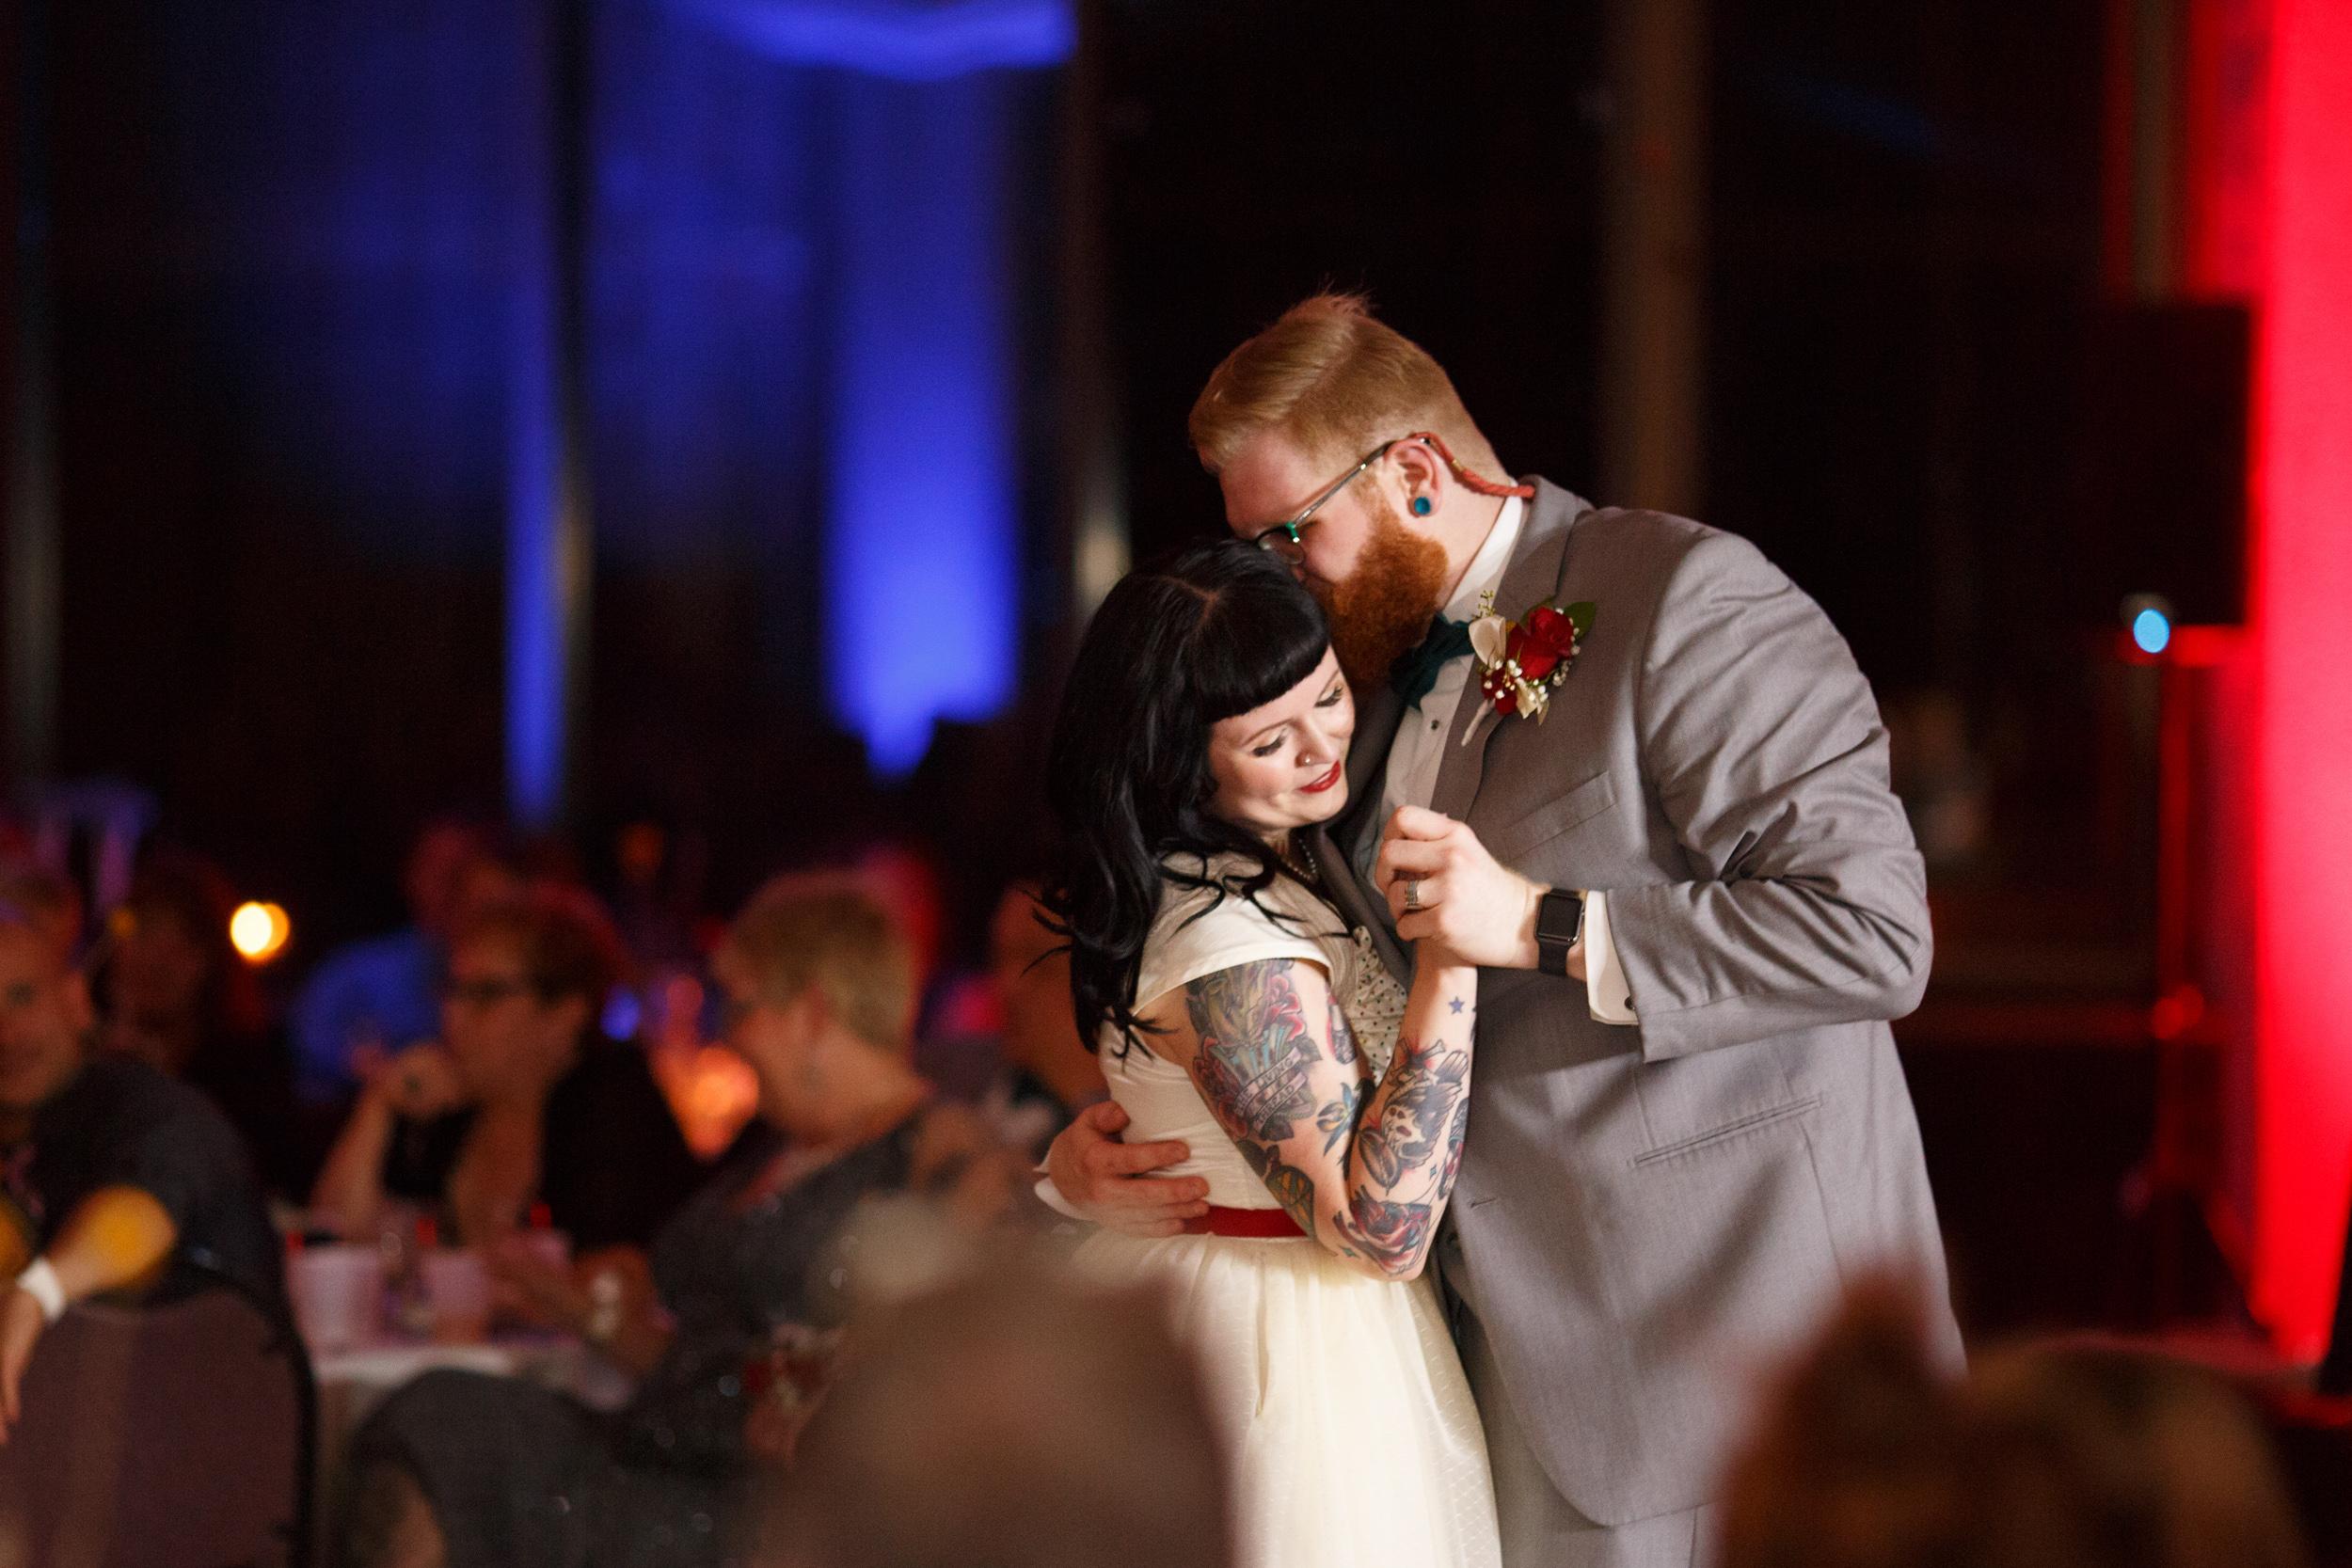 Christian & Sarah wedding photography by Brian milo-253.jpg